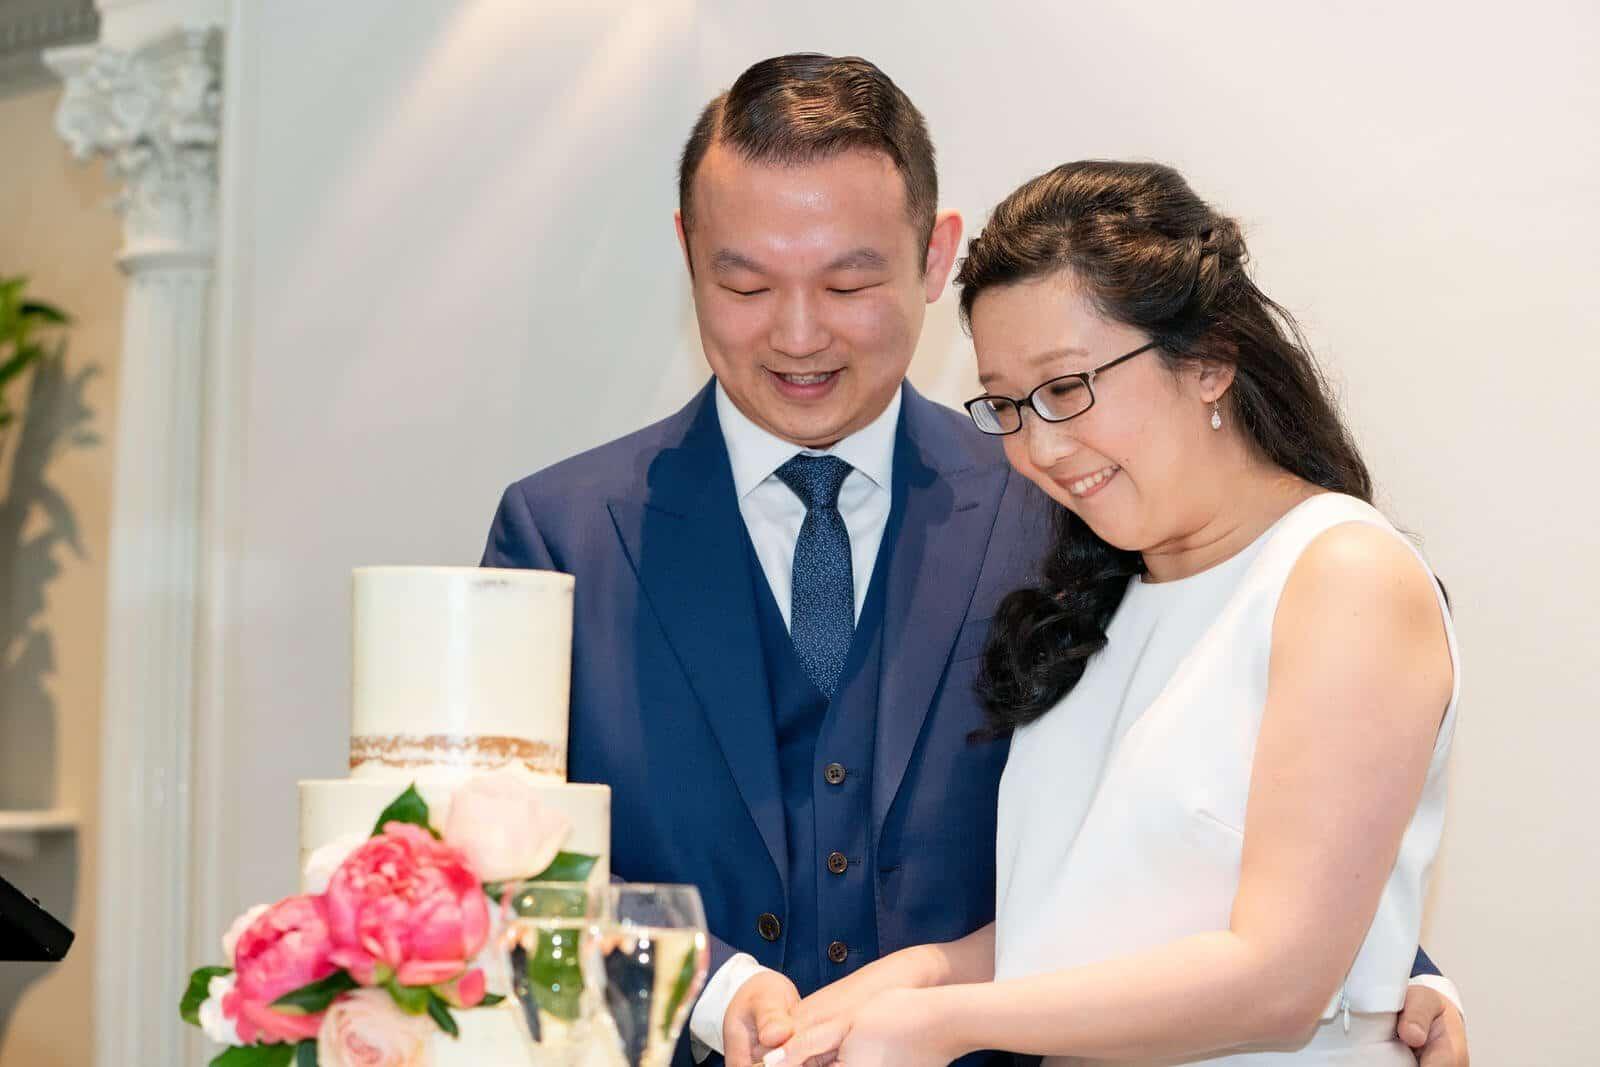 Quat Quatta | Wedding Reception Cake Cut